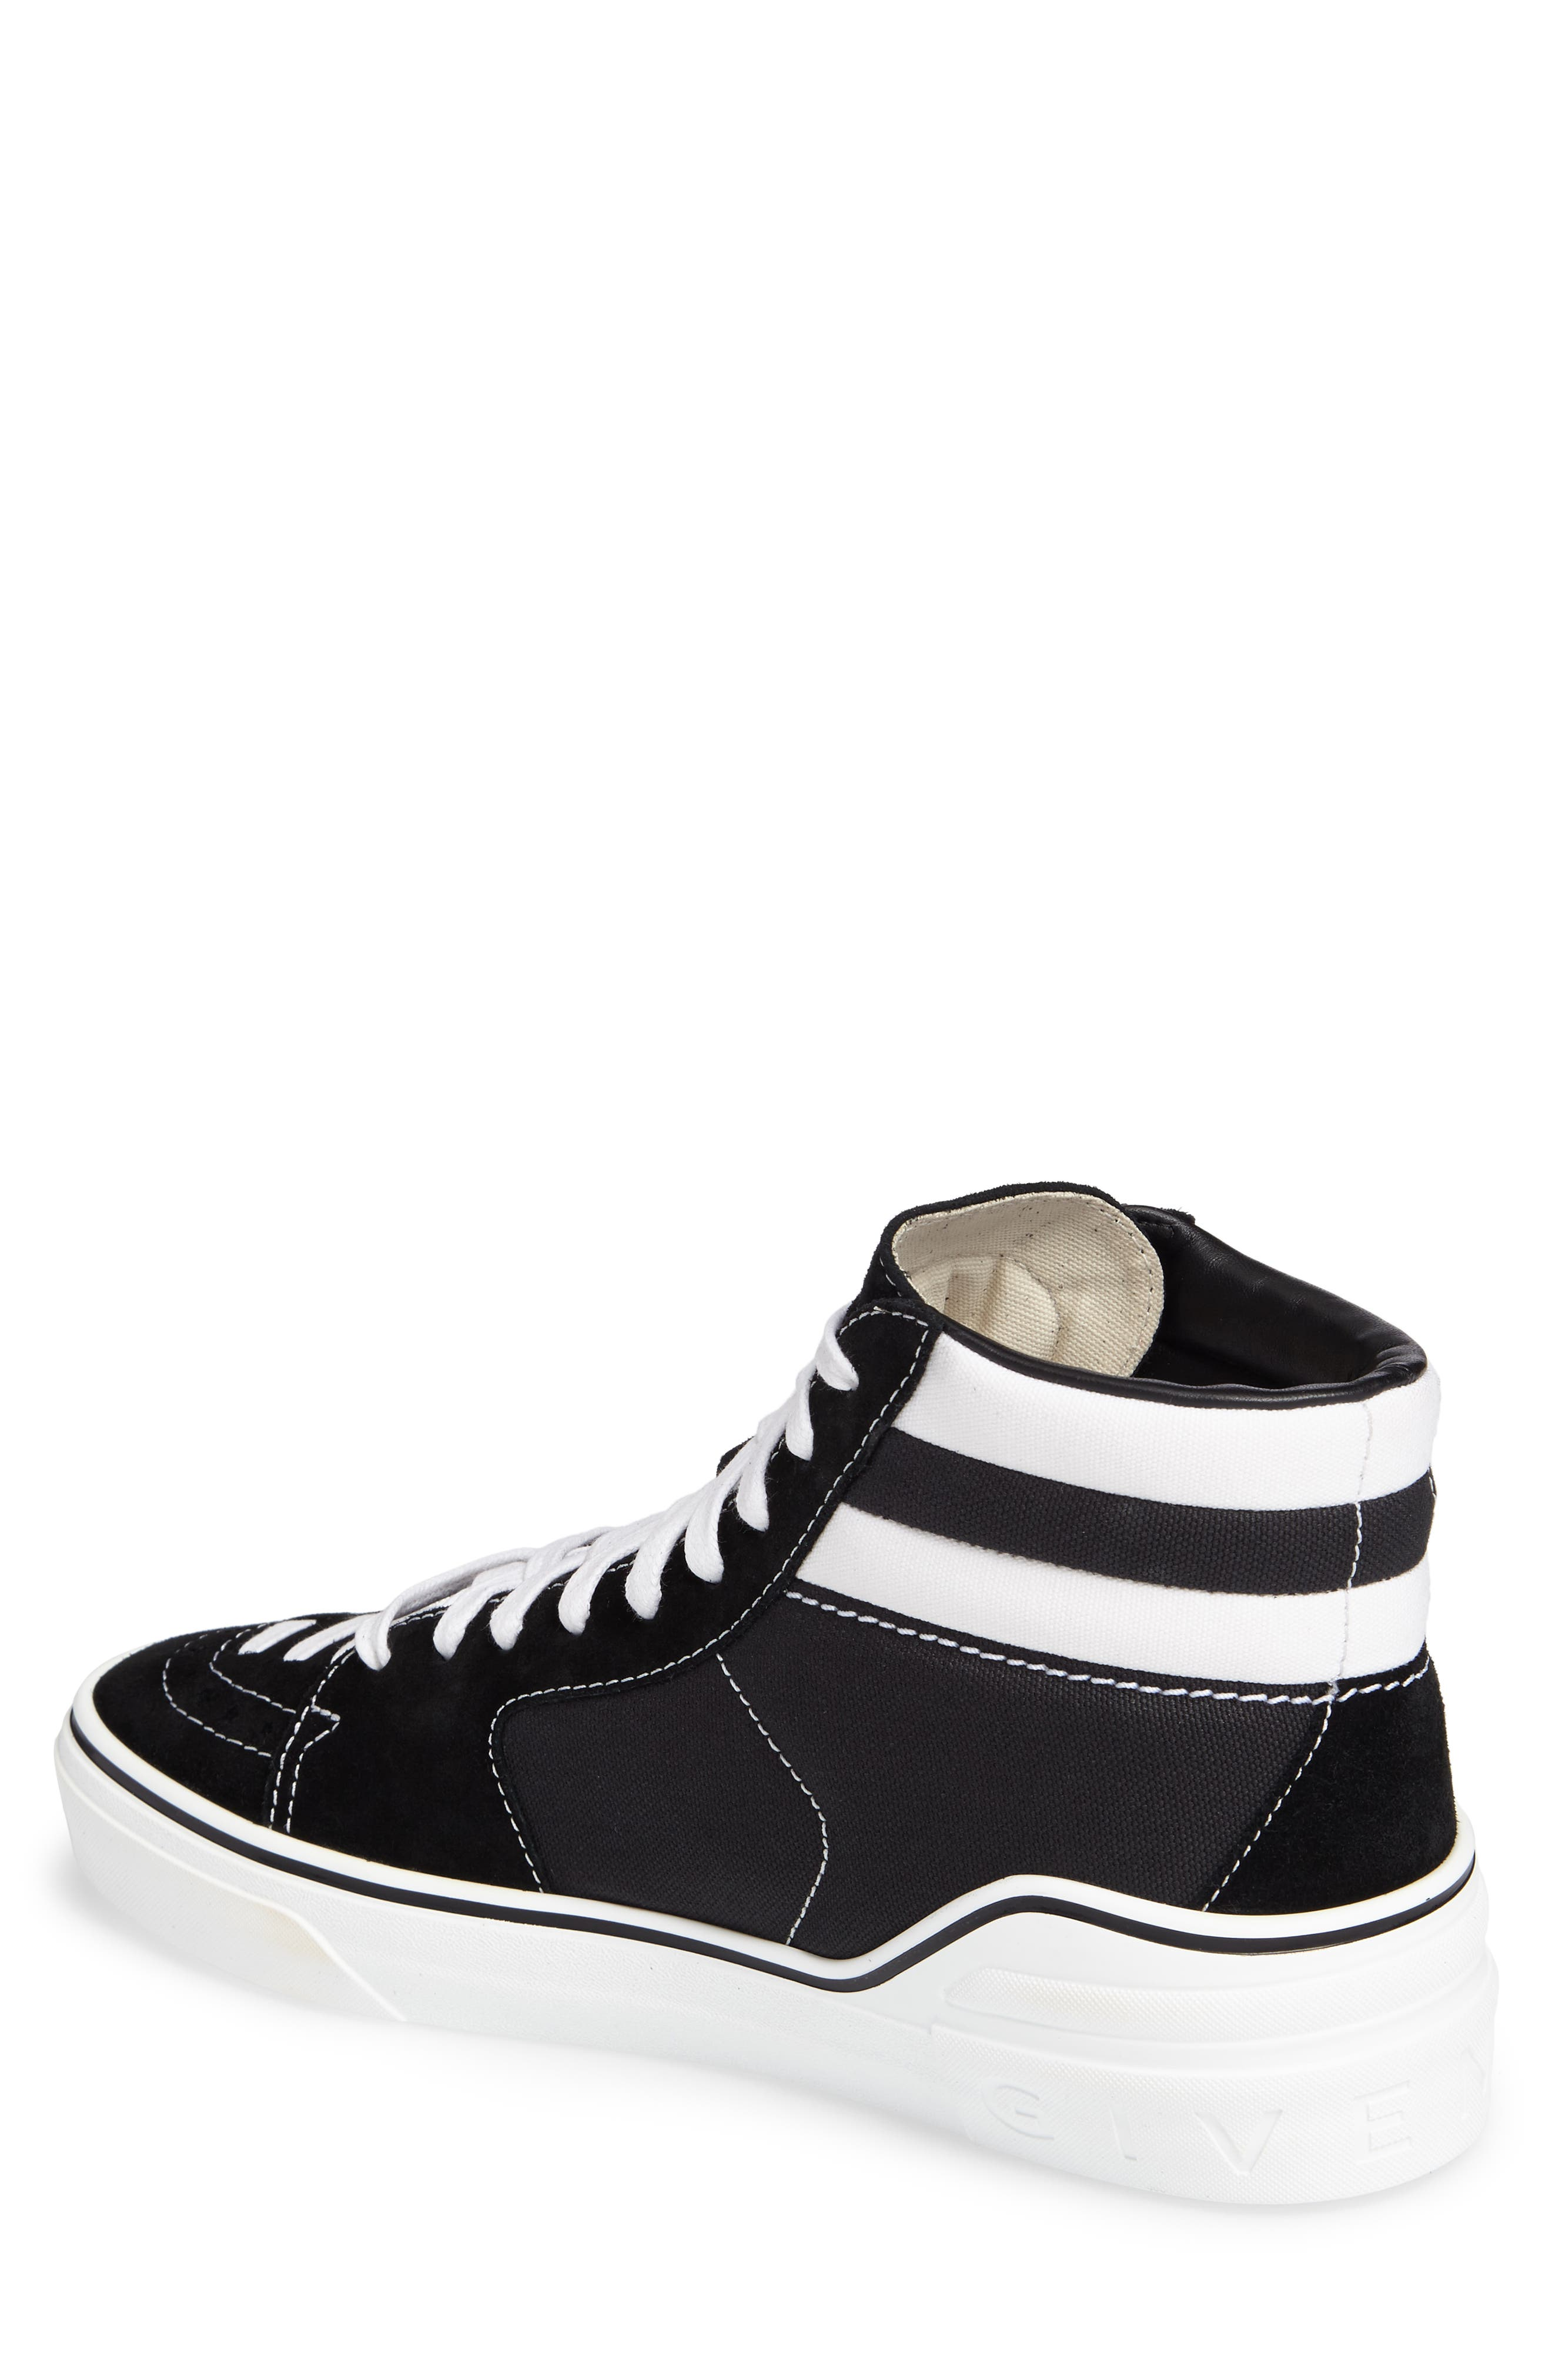 High Top Sneaker,                             Alternate thumbnail 2, color,                             004